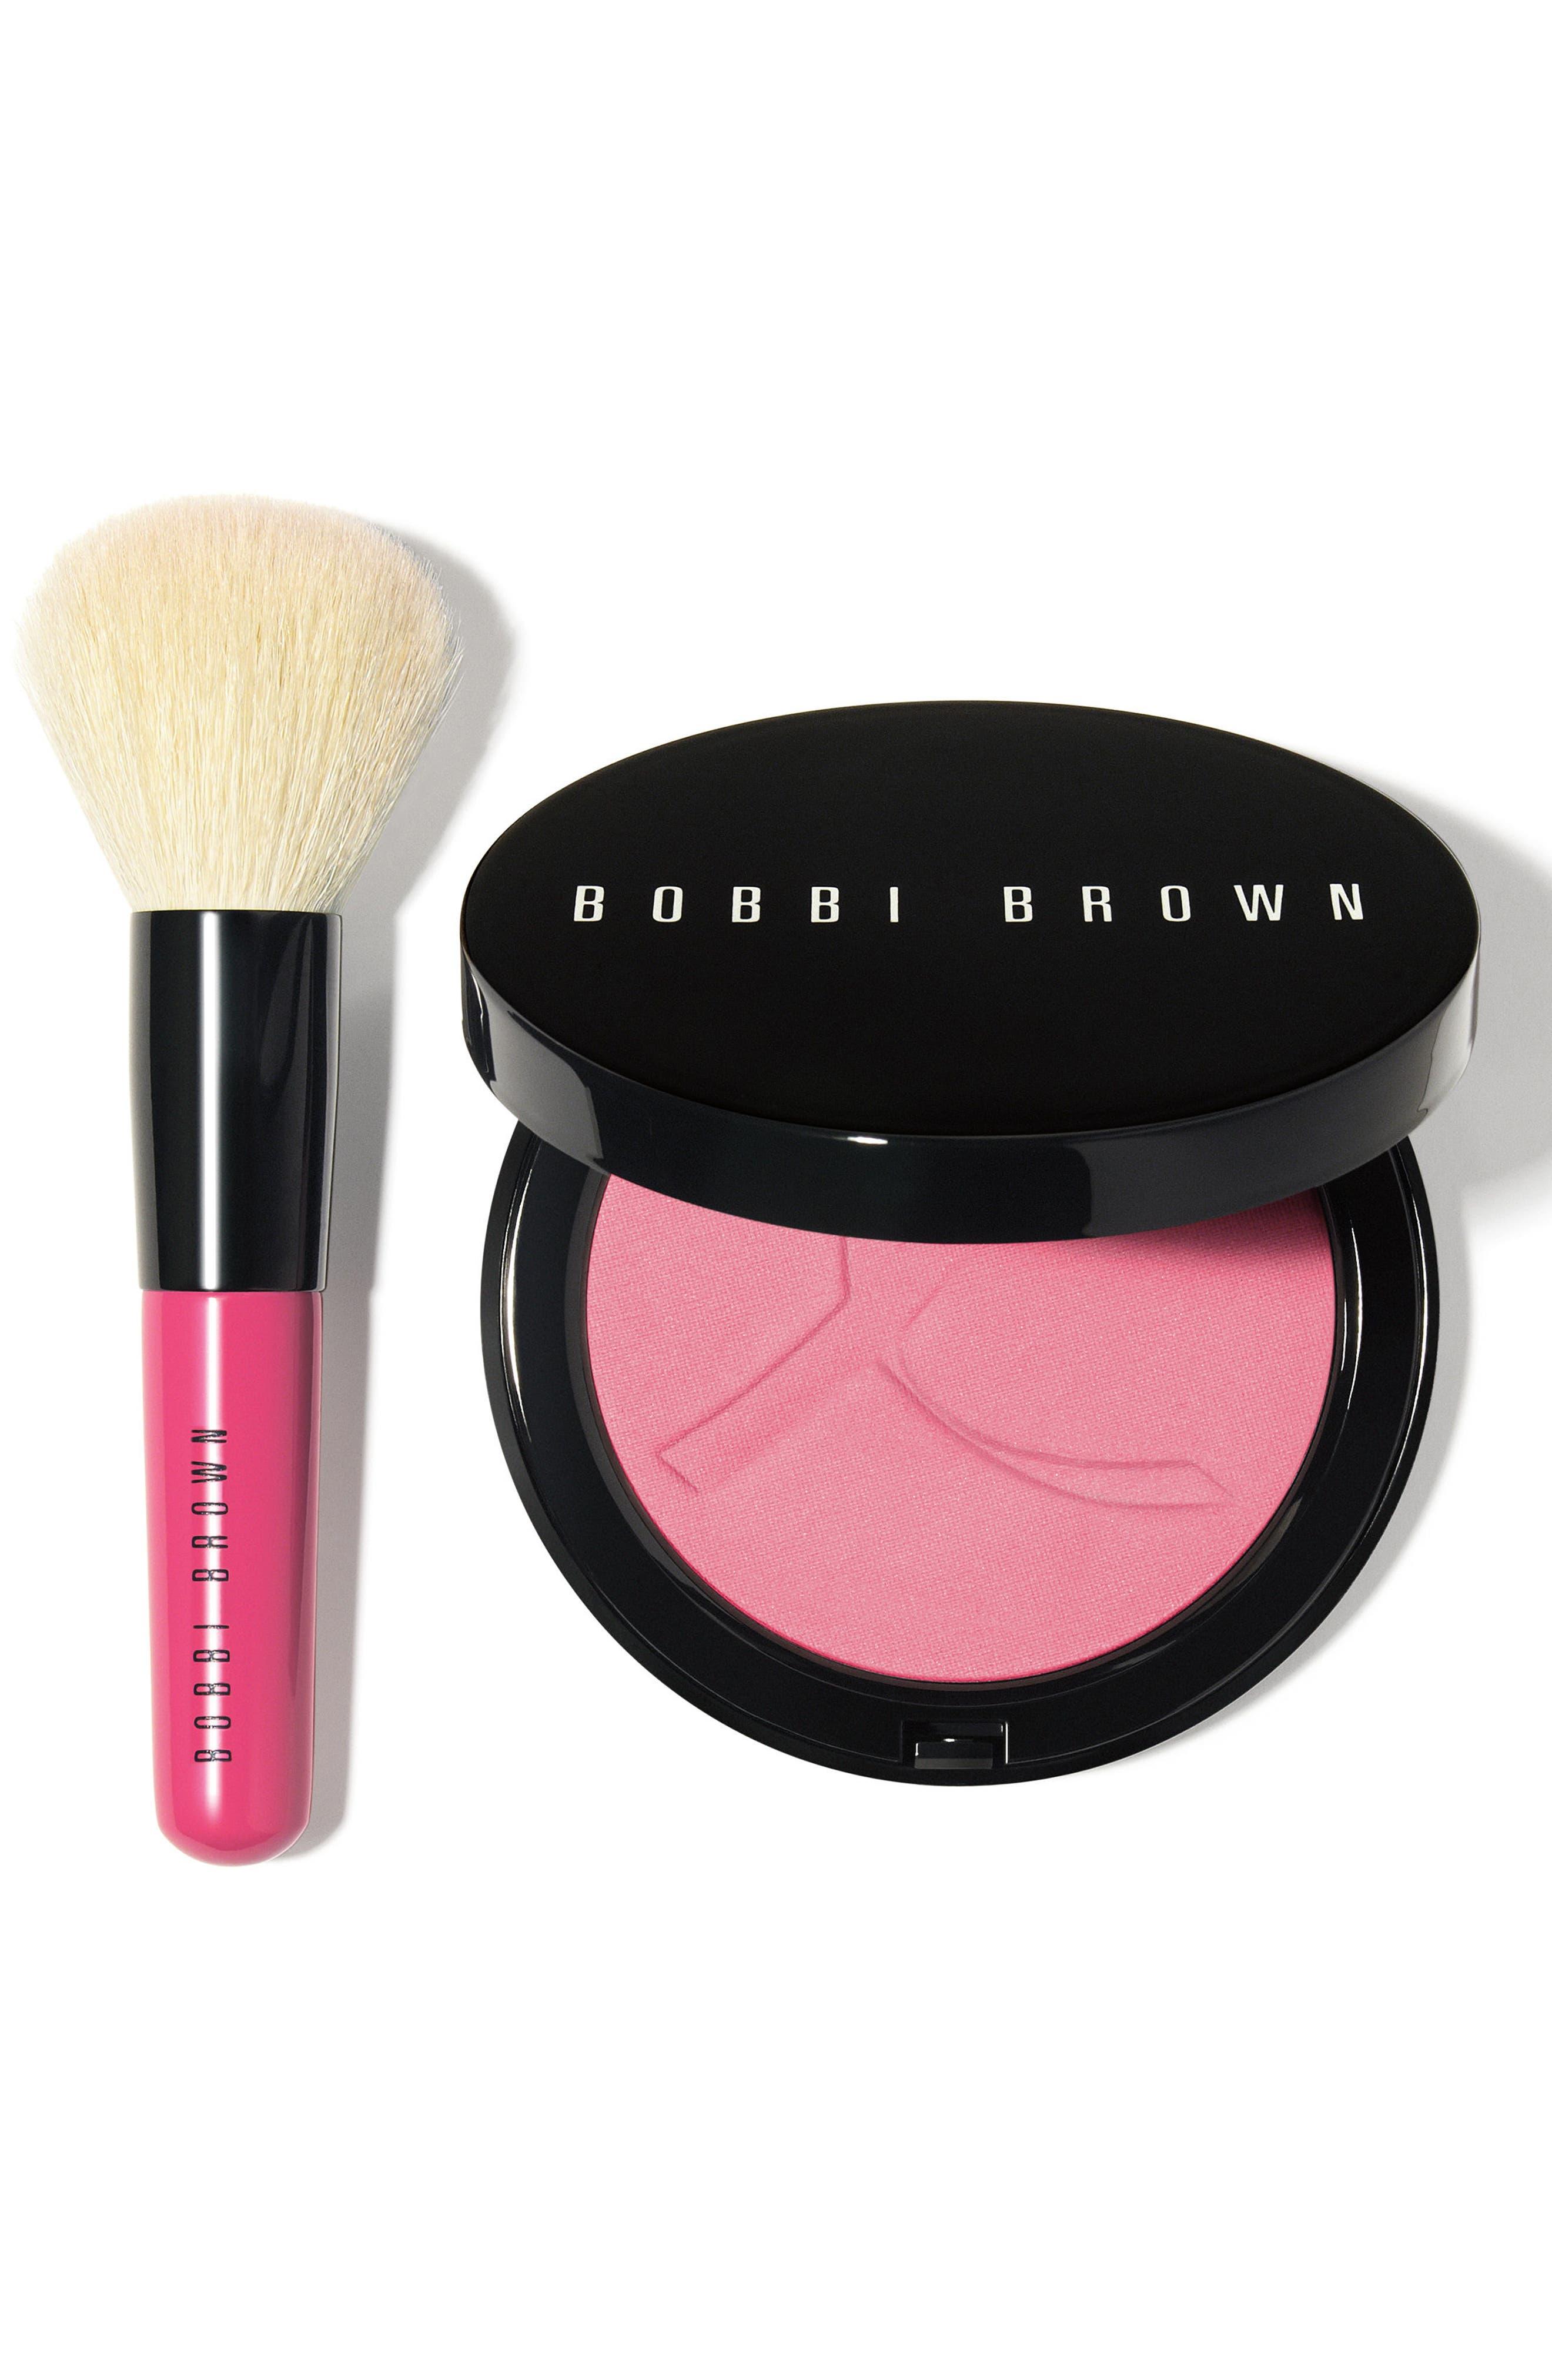 BOBBI BROWN, Pink Peony Illuminating Bronzing Powder Set, Main thumbnail 1, color, 000